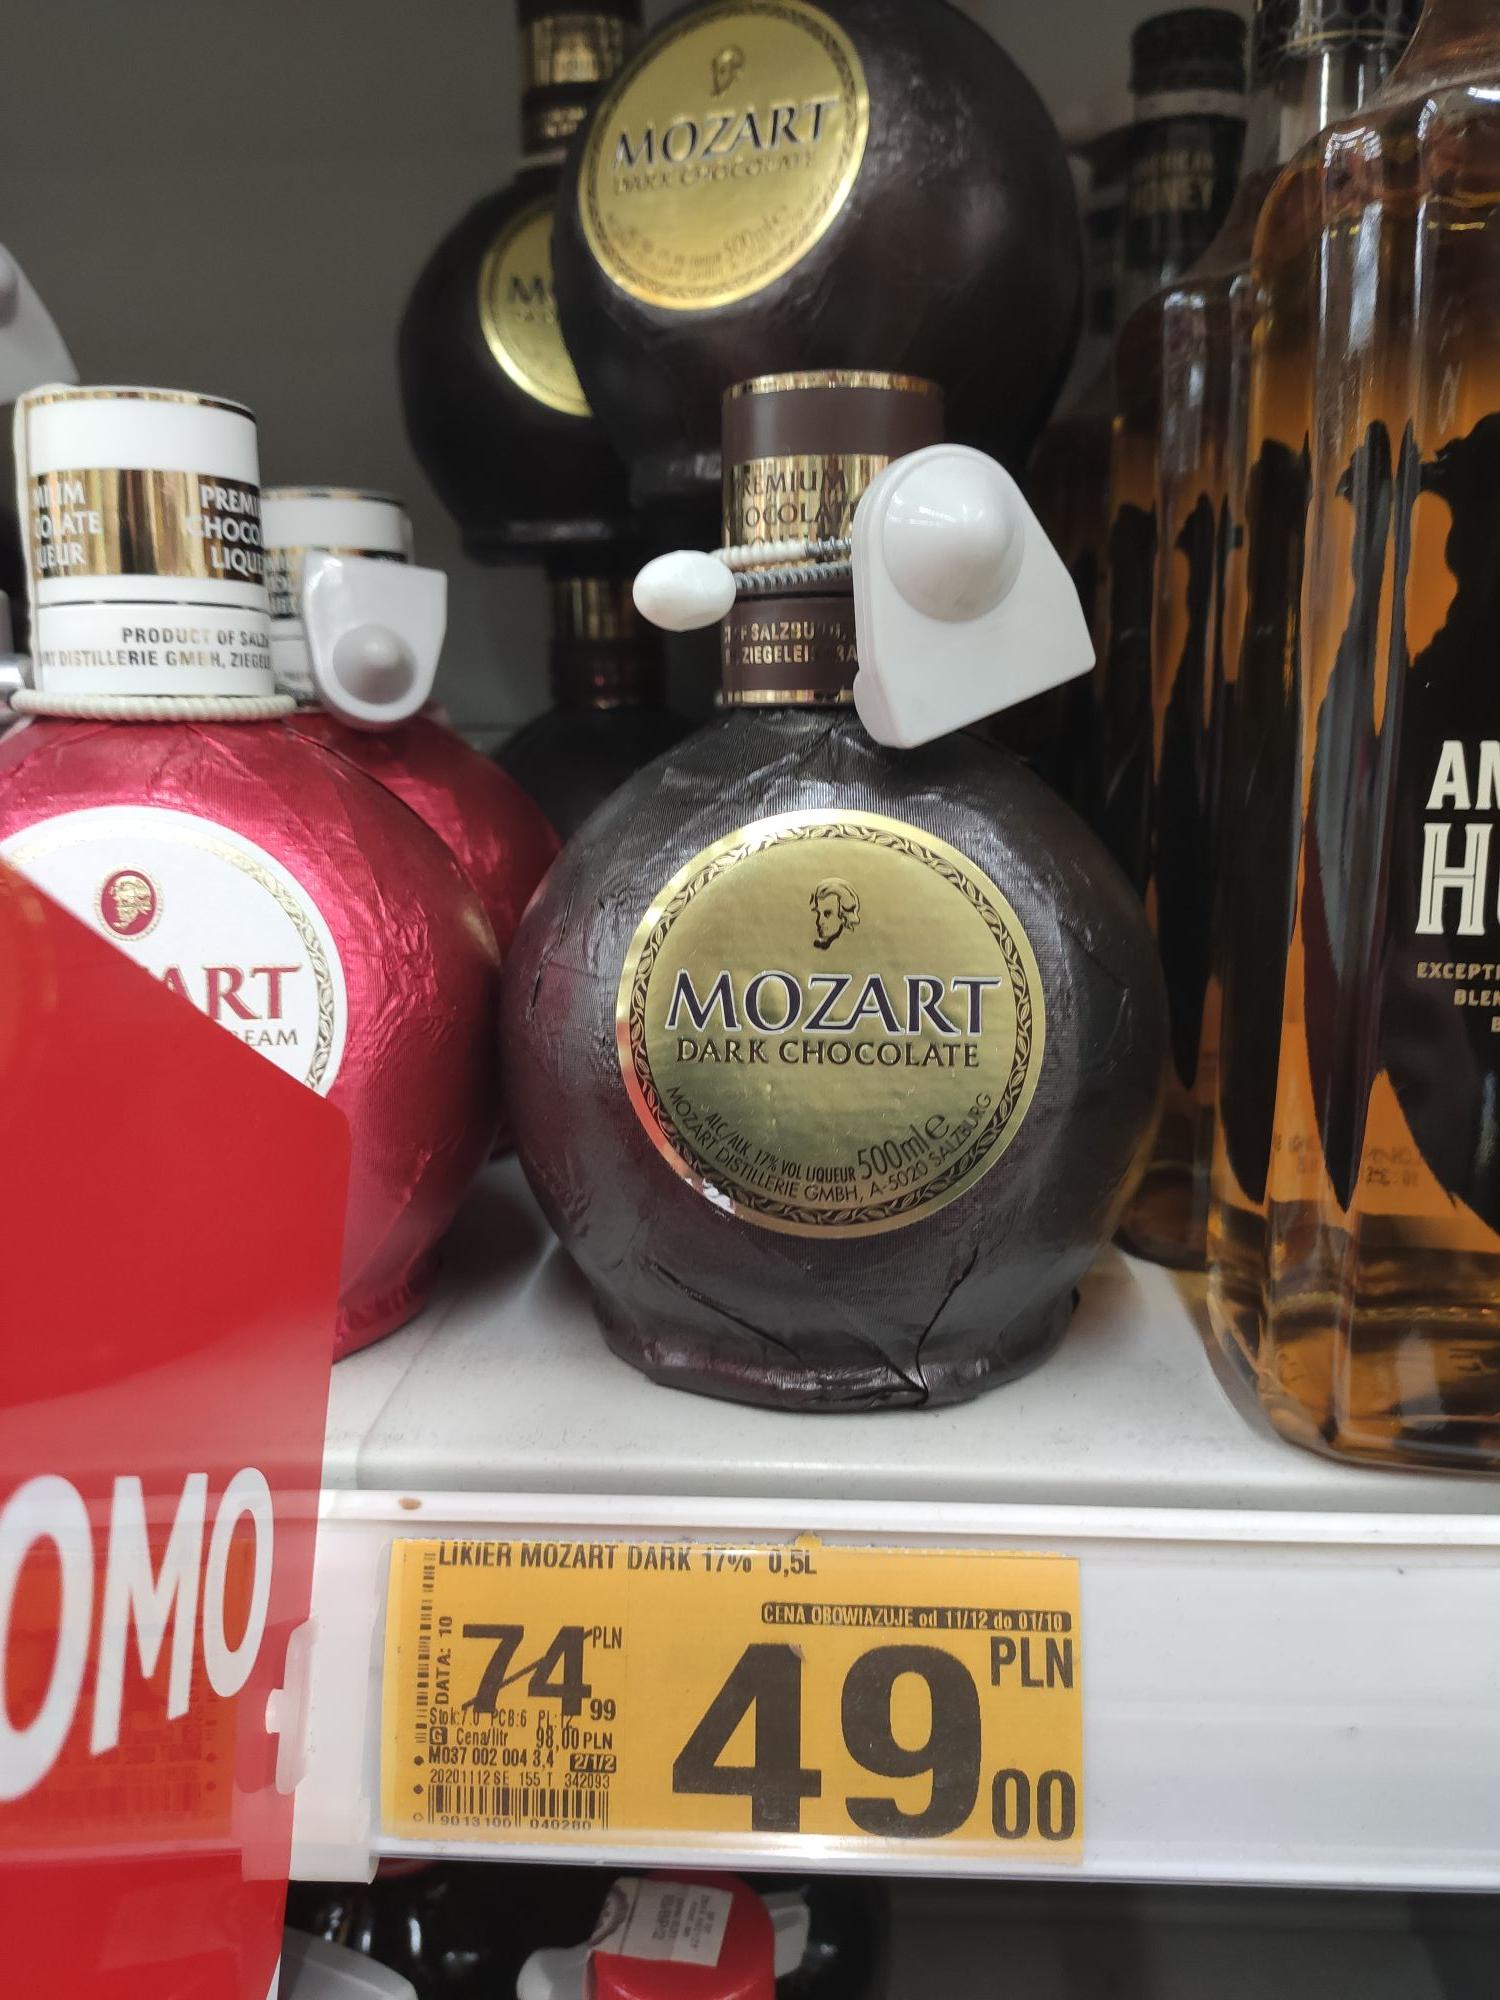 Likier Mozart Dark Chocolate 0.5L